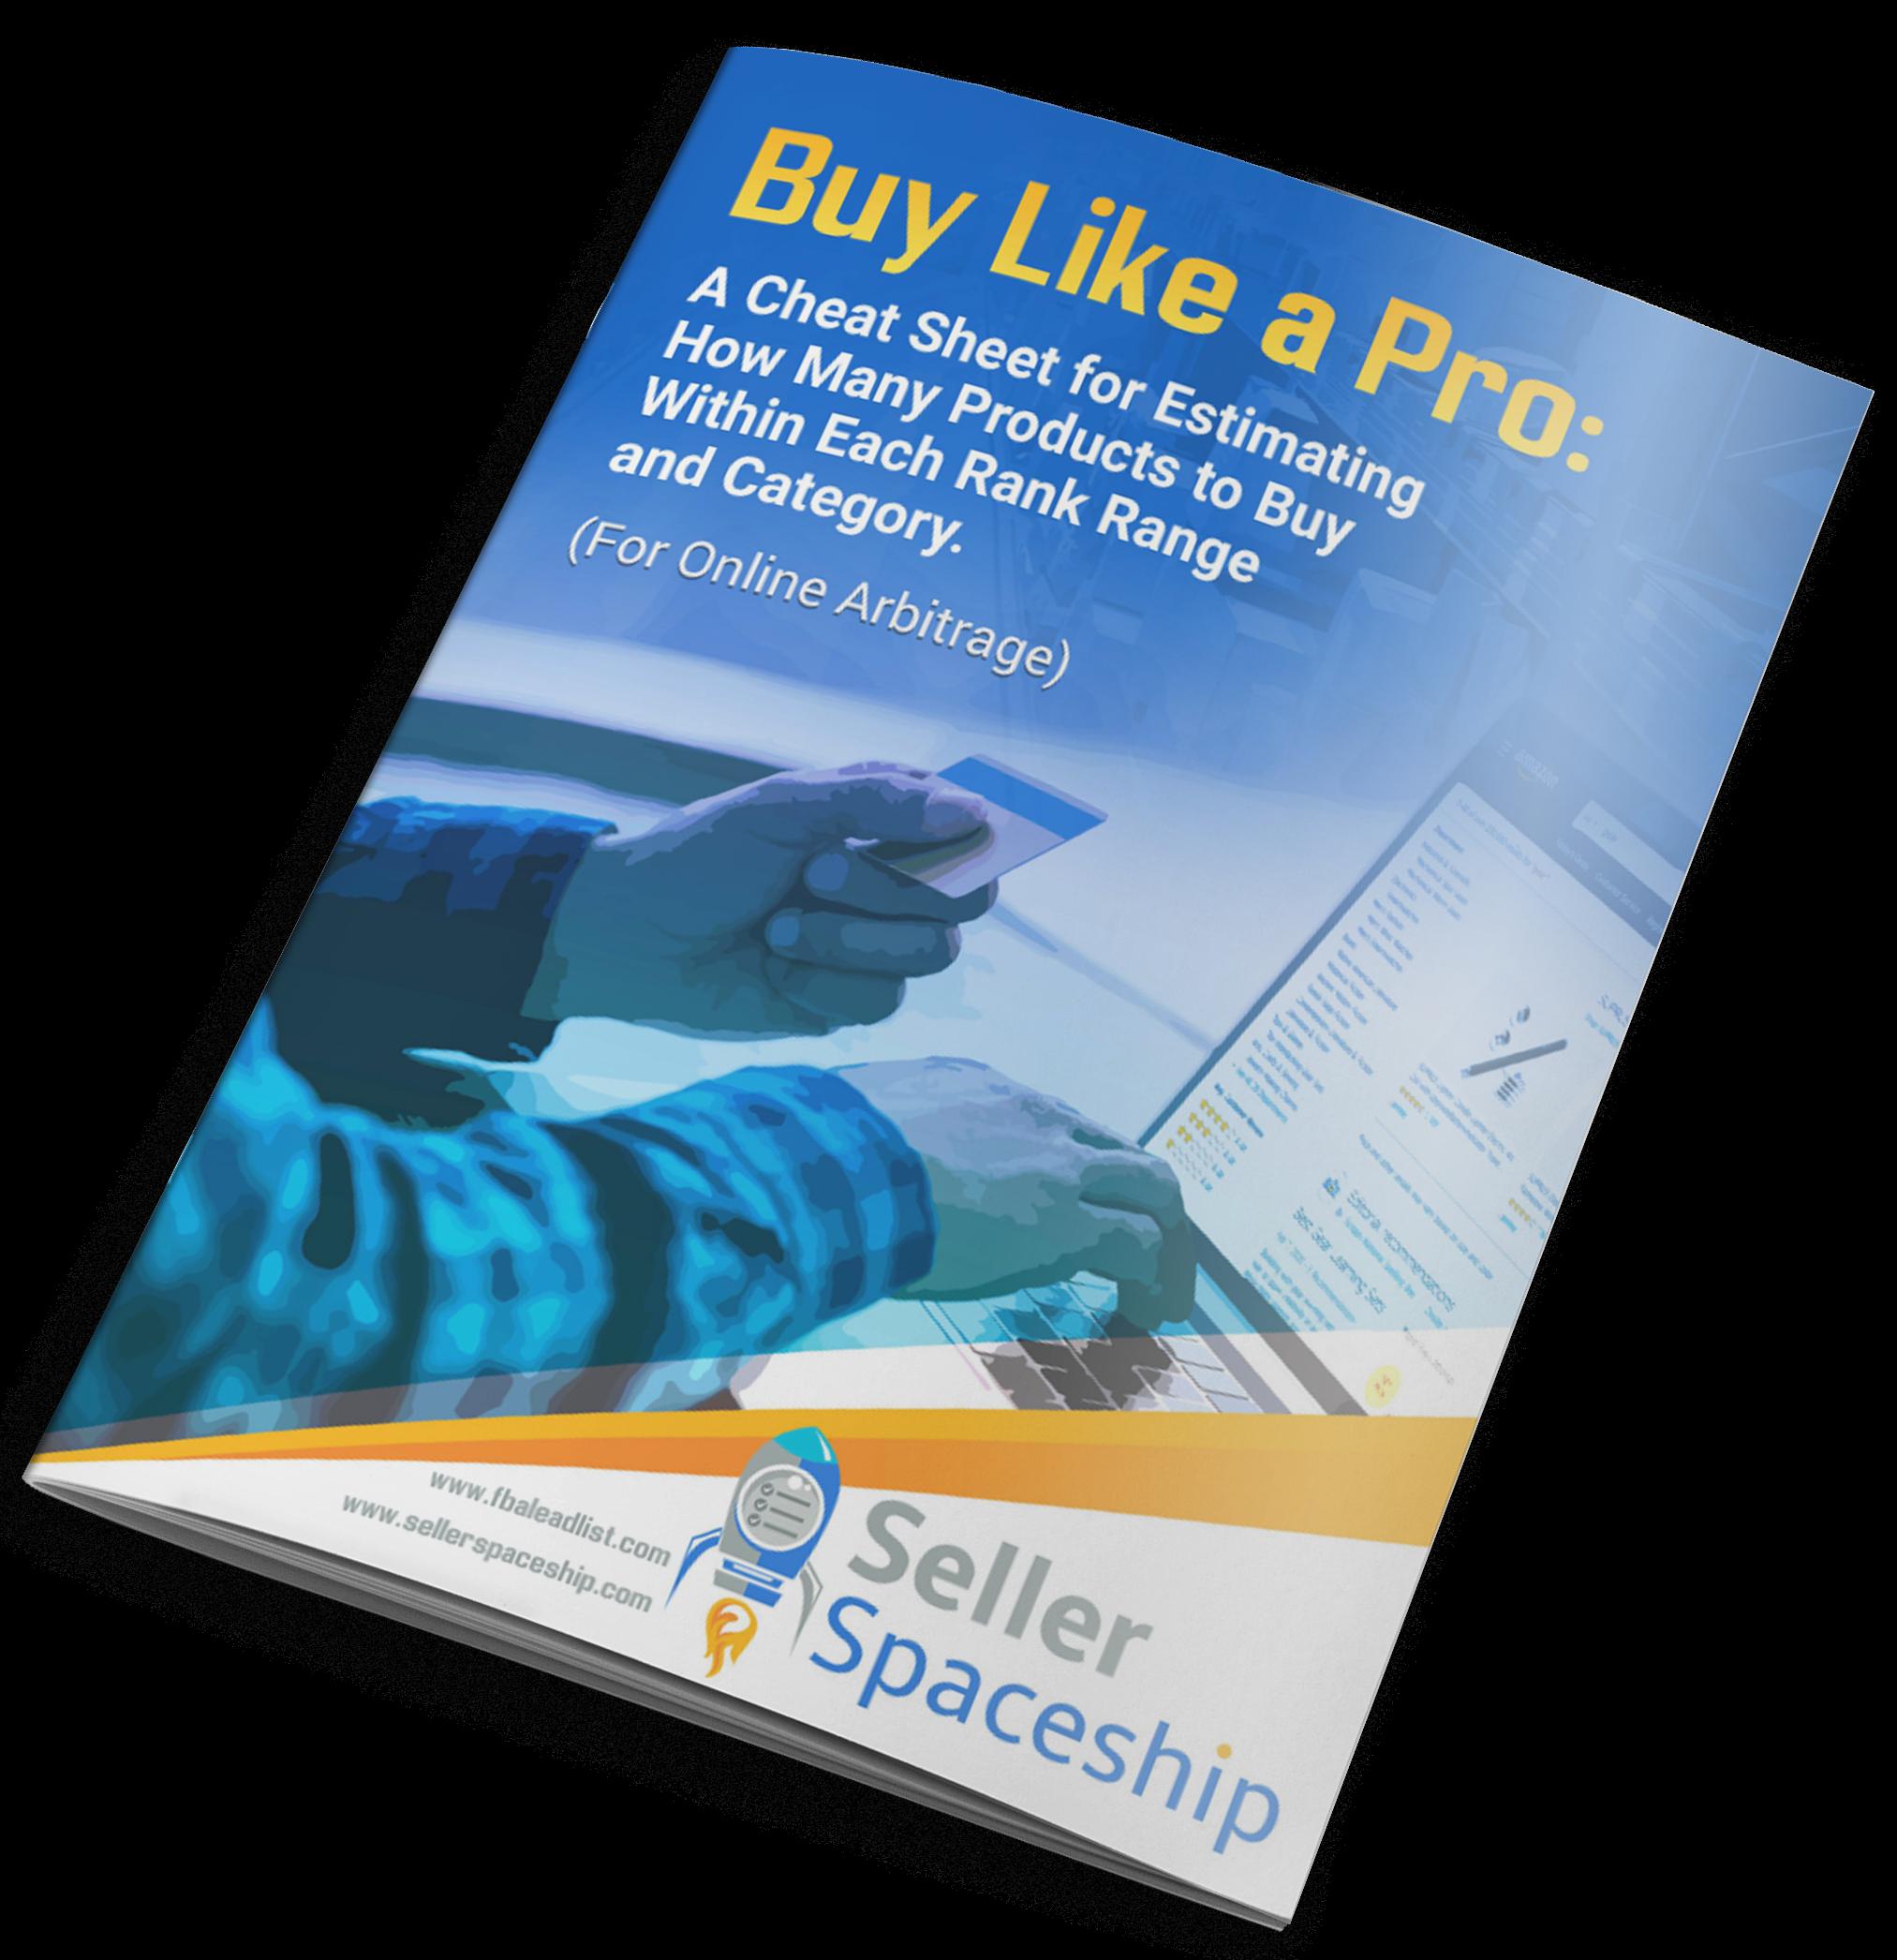 Buy Like a Pro - Online Arbitrage - Sellerspaceship.com